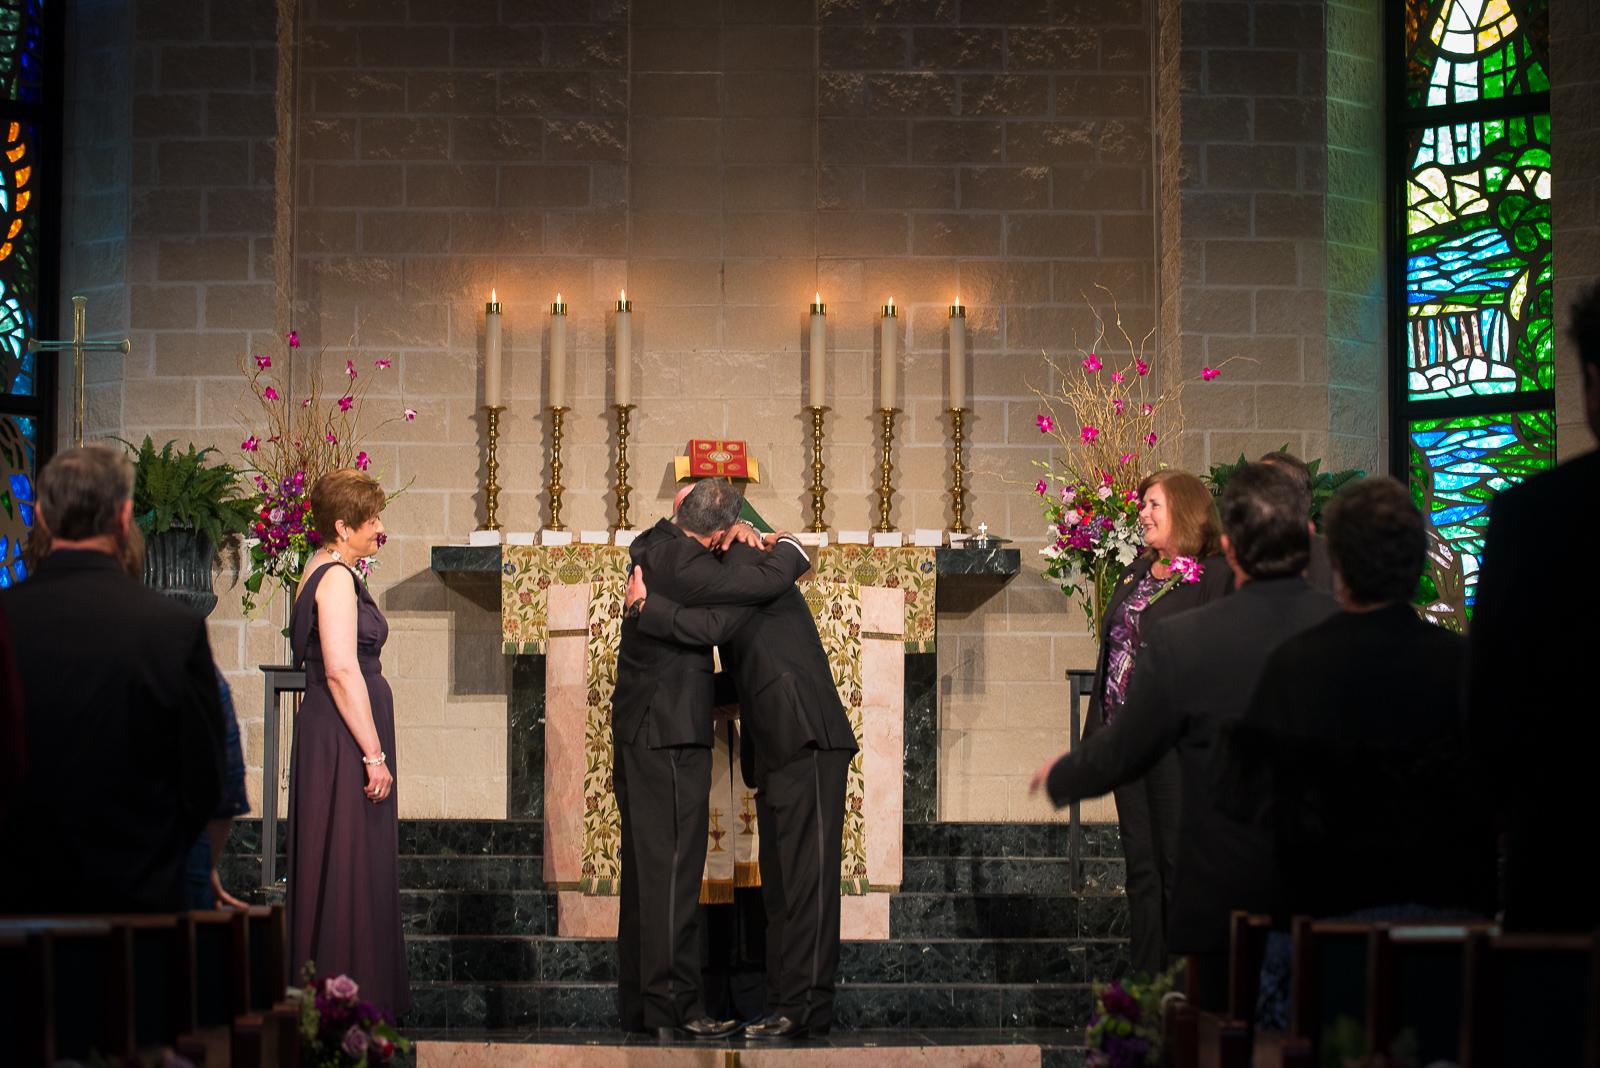 Michael-Napier-Weddings-Ludwig-Guilbeau Wedding-20 (20).jpg